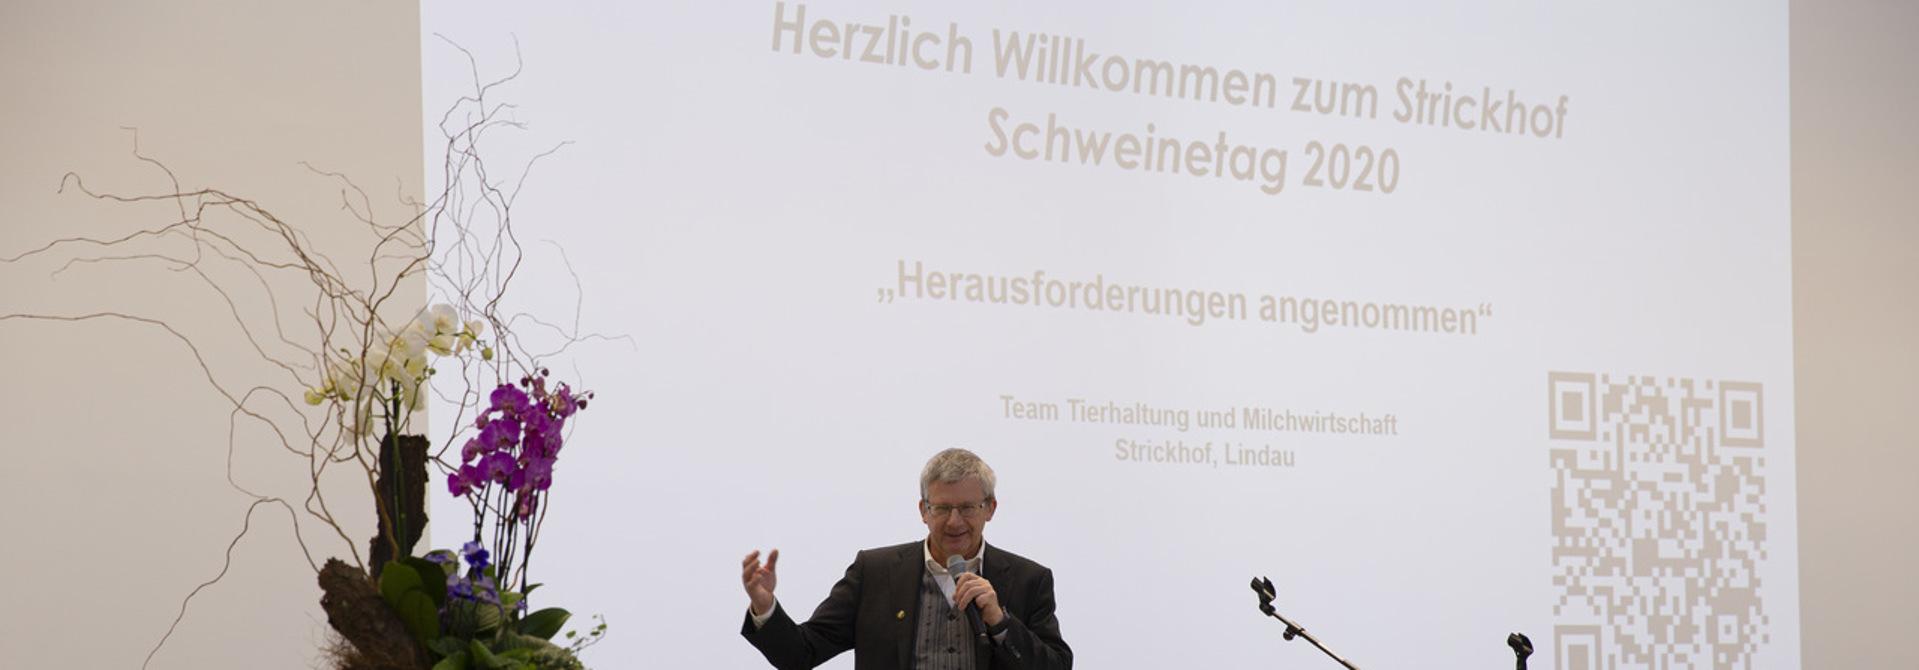 Matthias Schick, Strickhof>